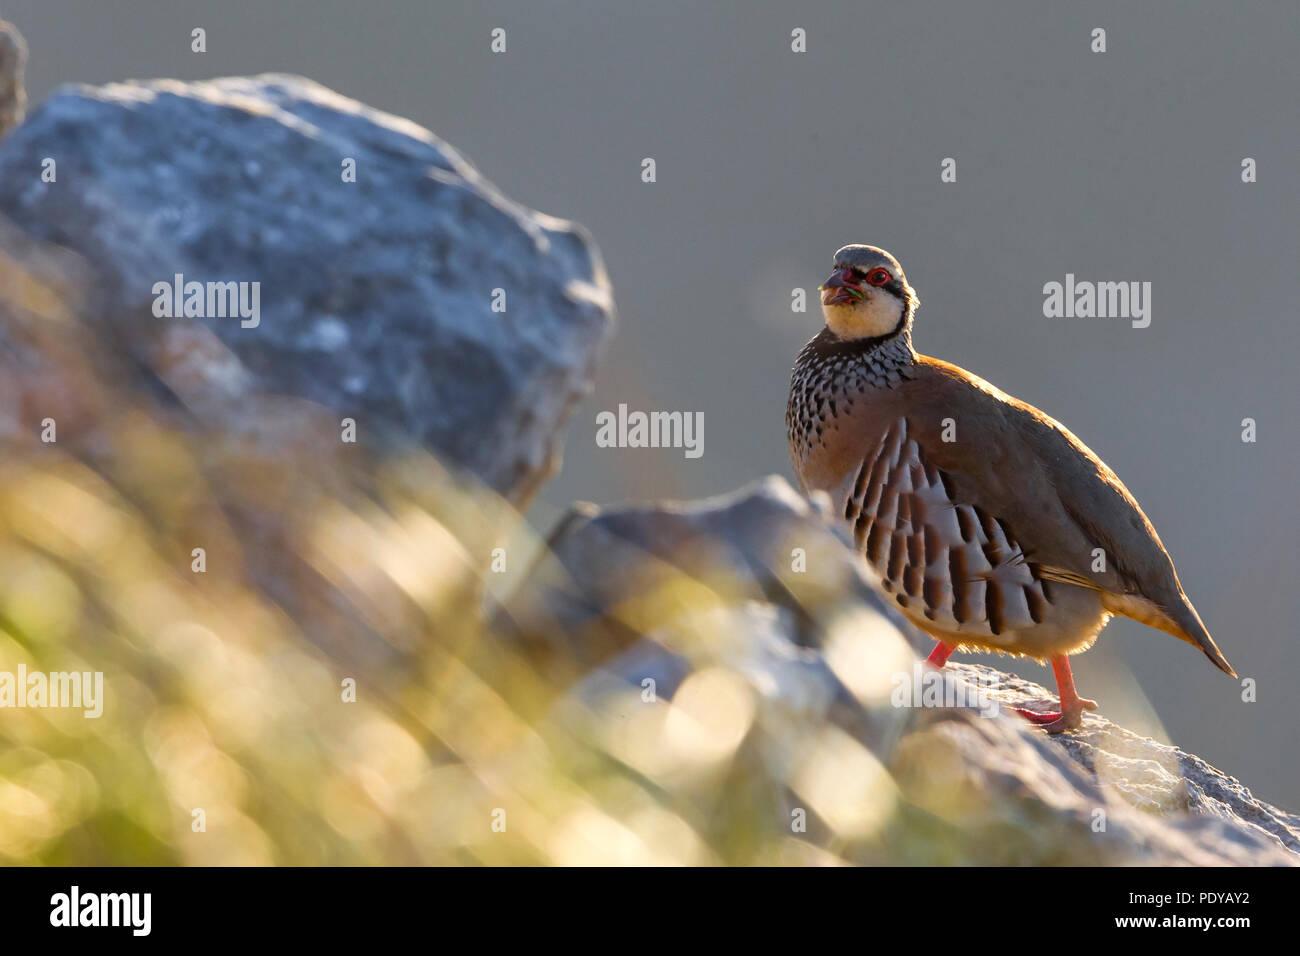 Red-legged Partridge; Alectoris rufa - Stock Image